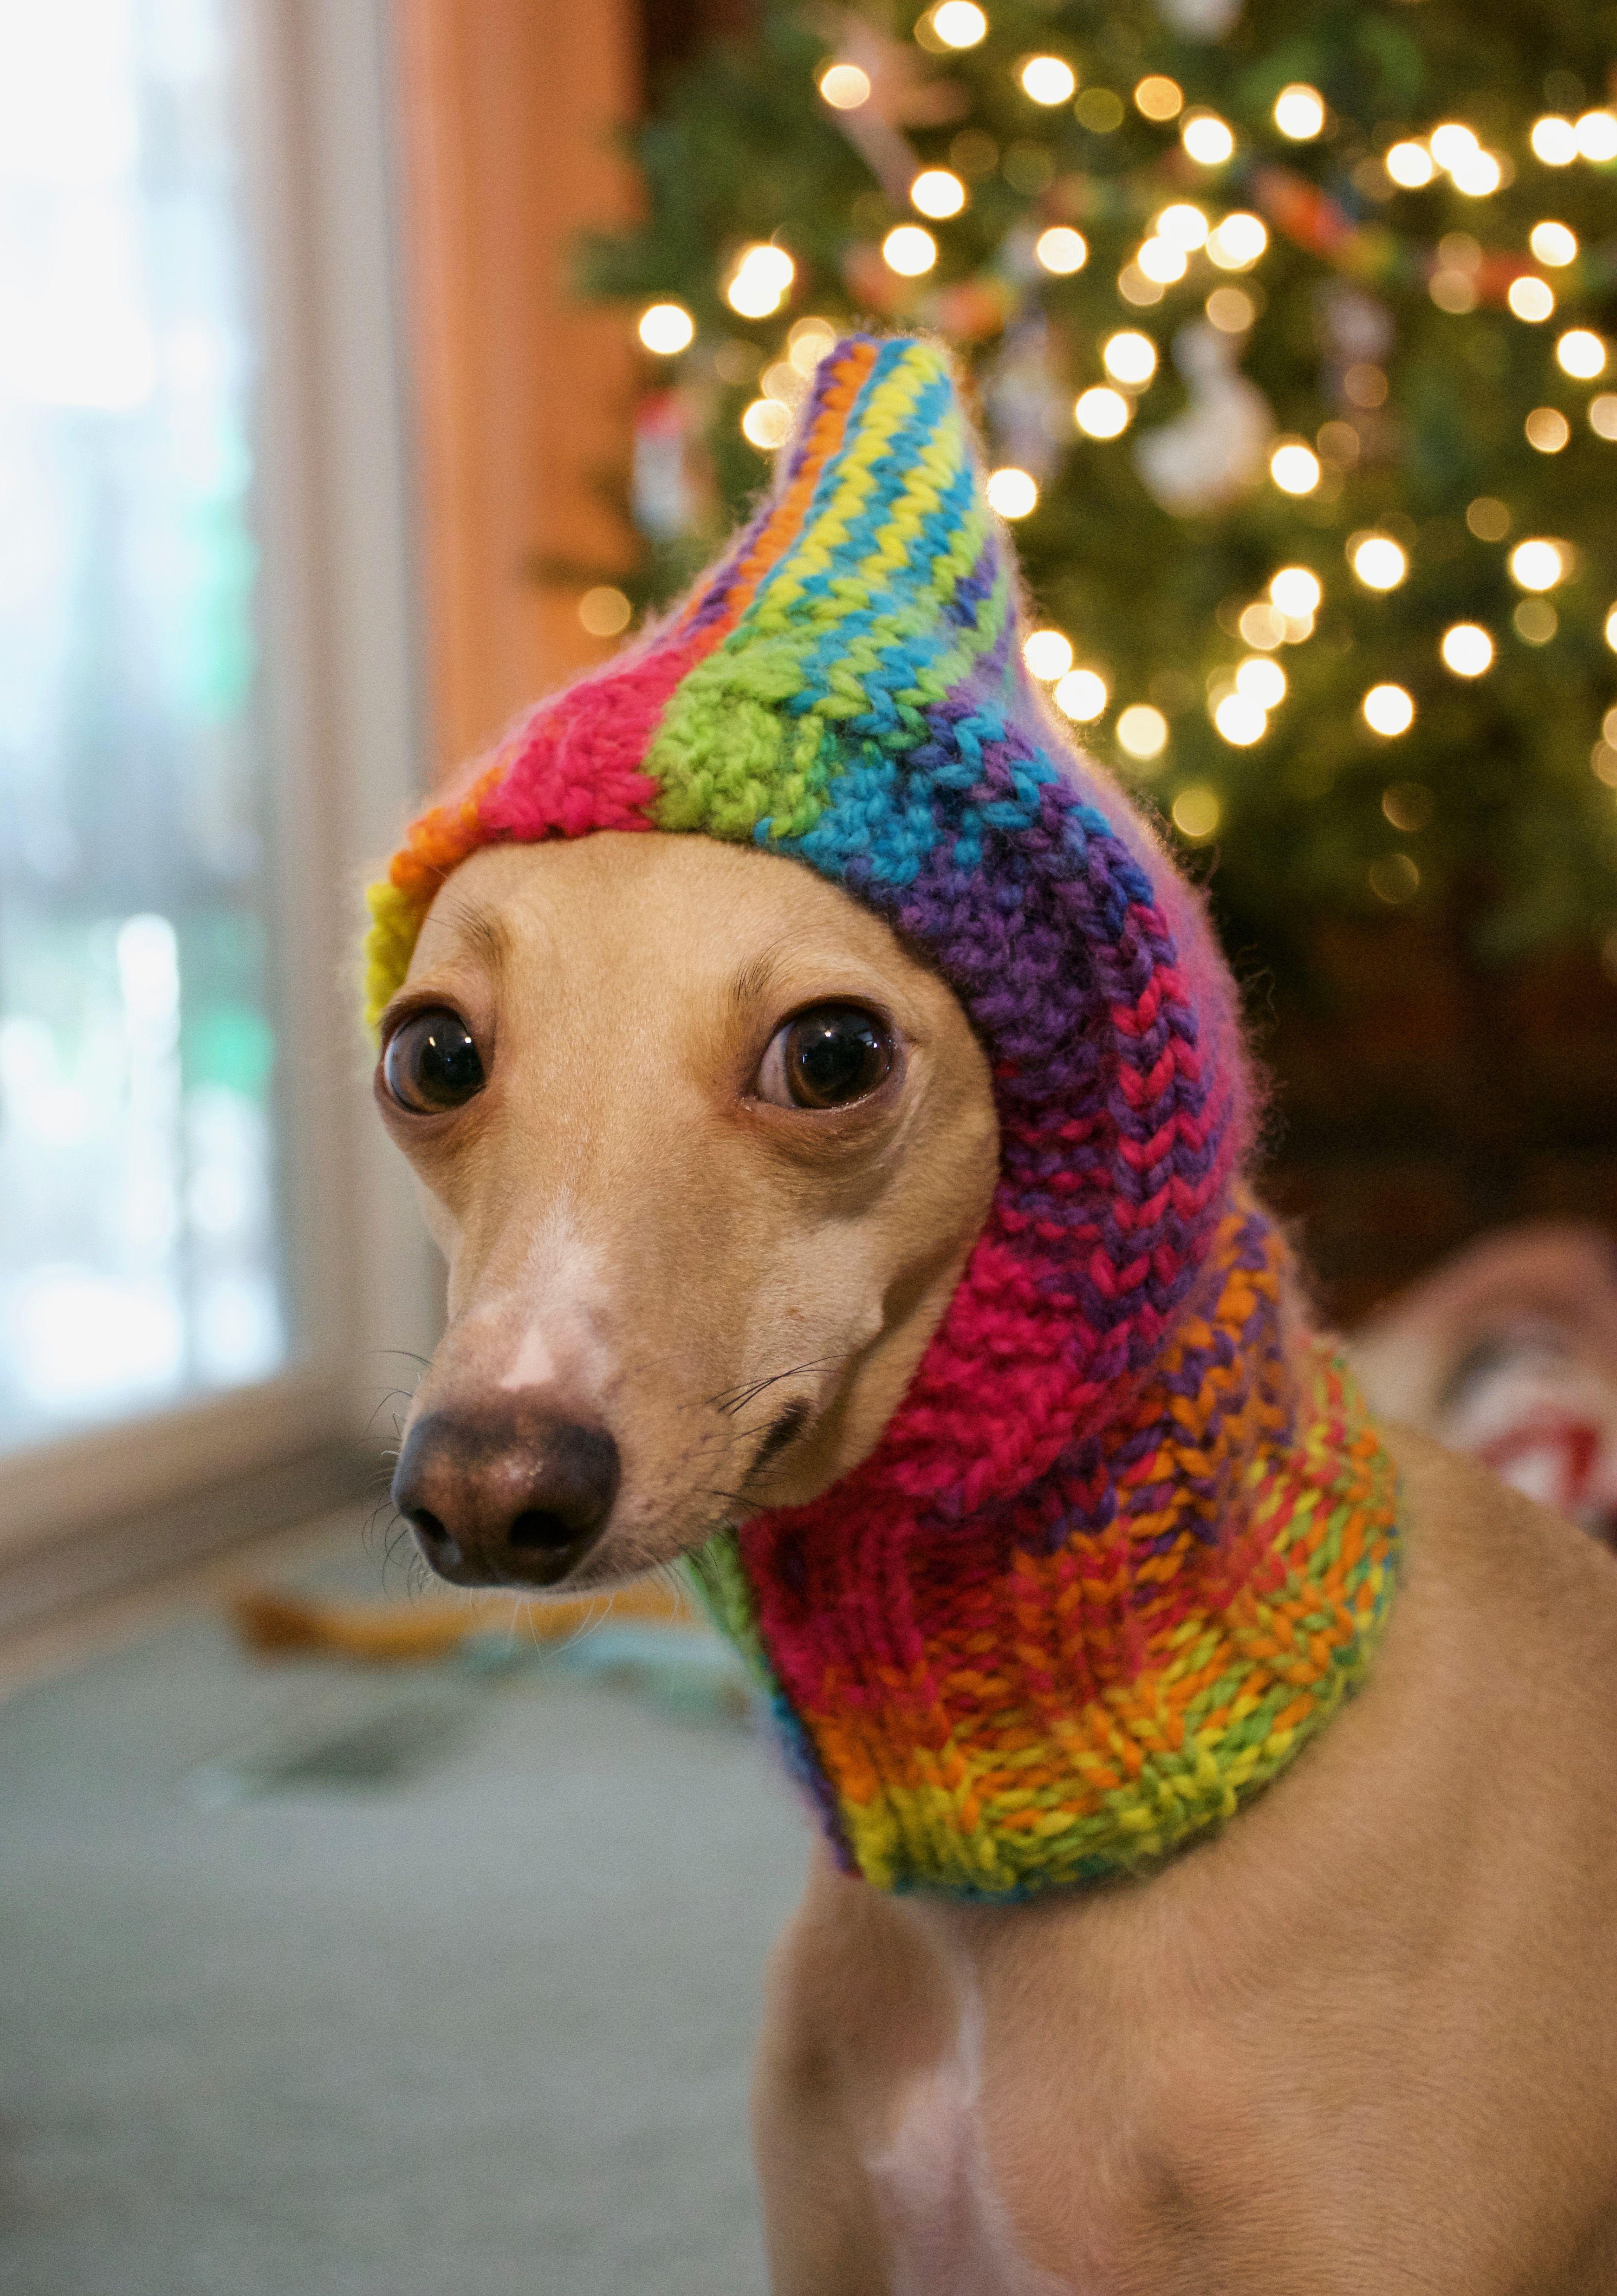 The francesca snood hand knit dog hat pattern available soon the francesca snood hand knit dog hat pattern available soon italian greyhound bankloansurffo Images